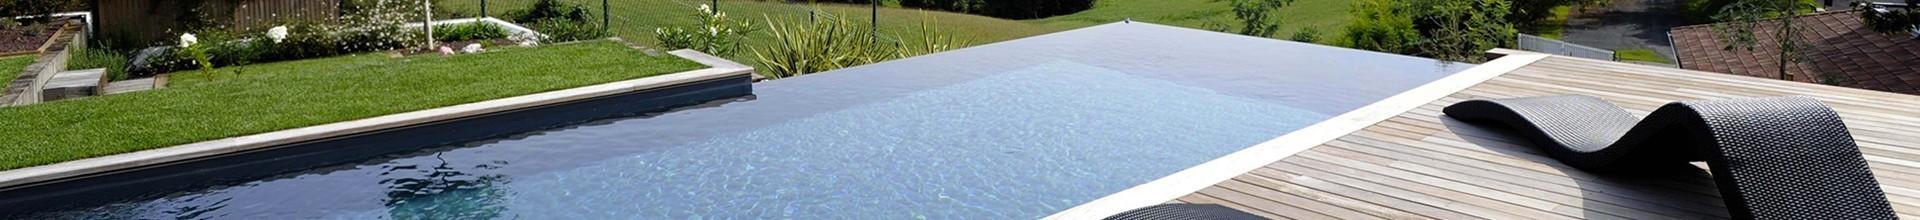 Direct usine, piscine coque prix Moselle